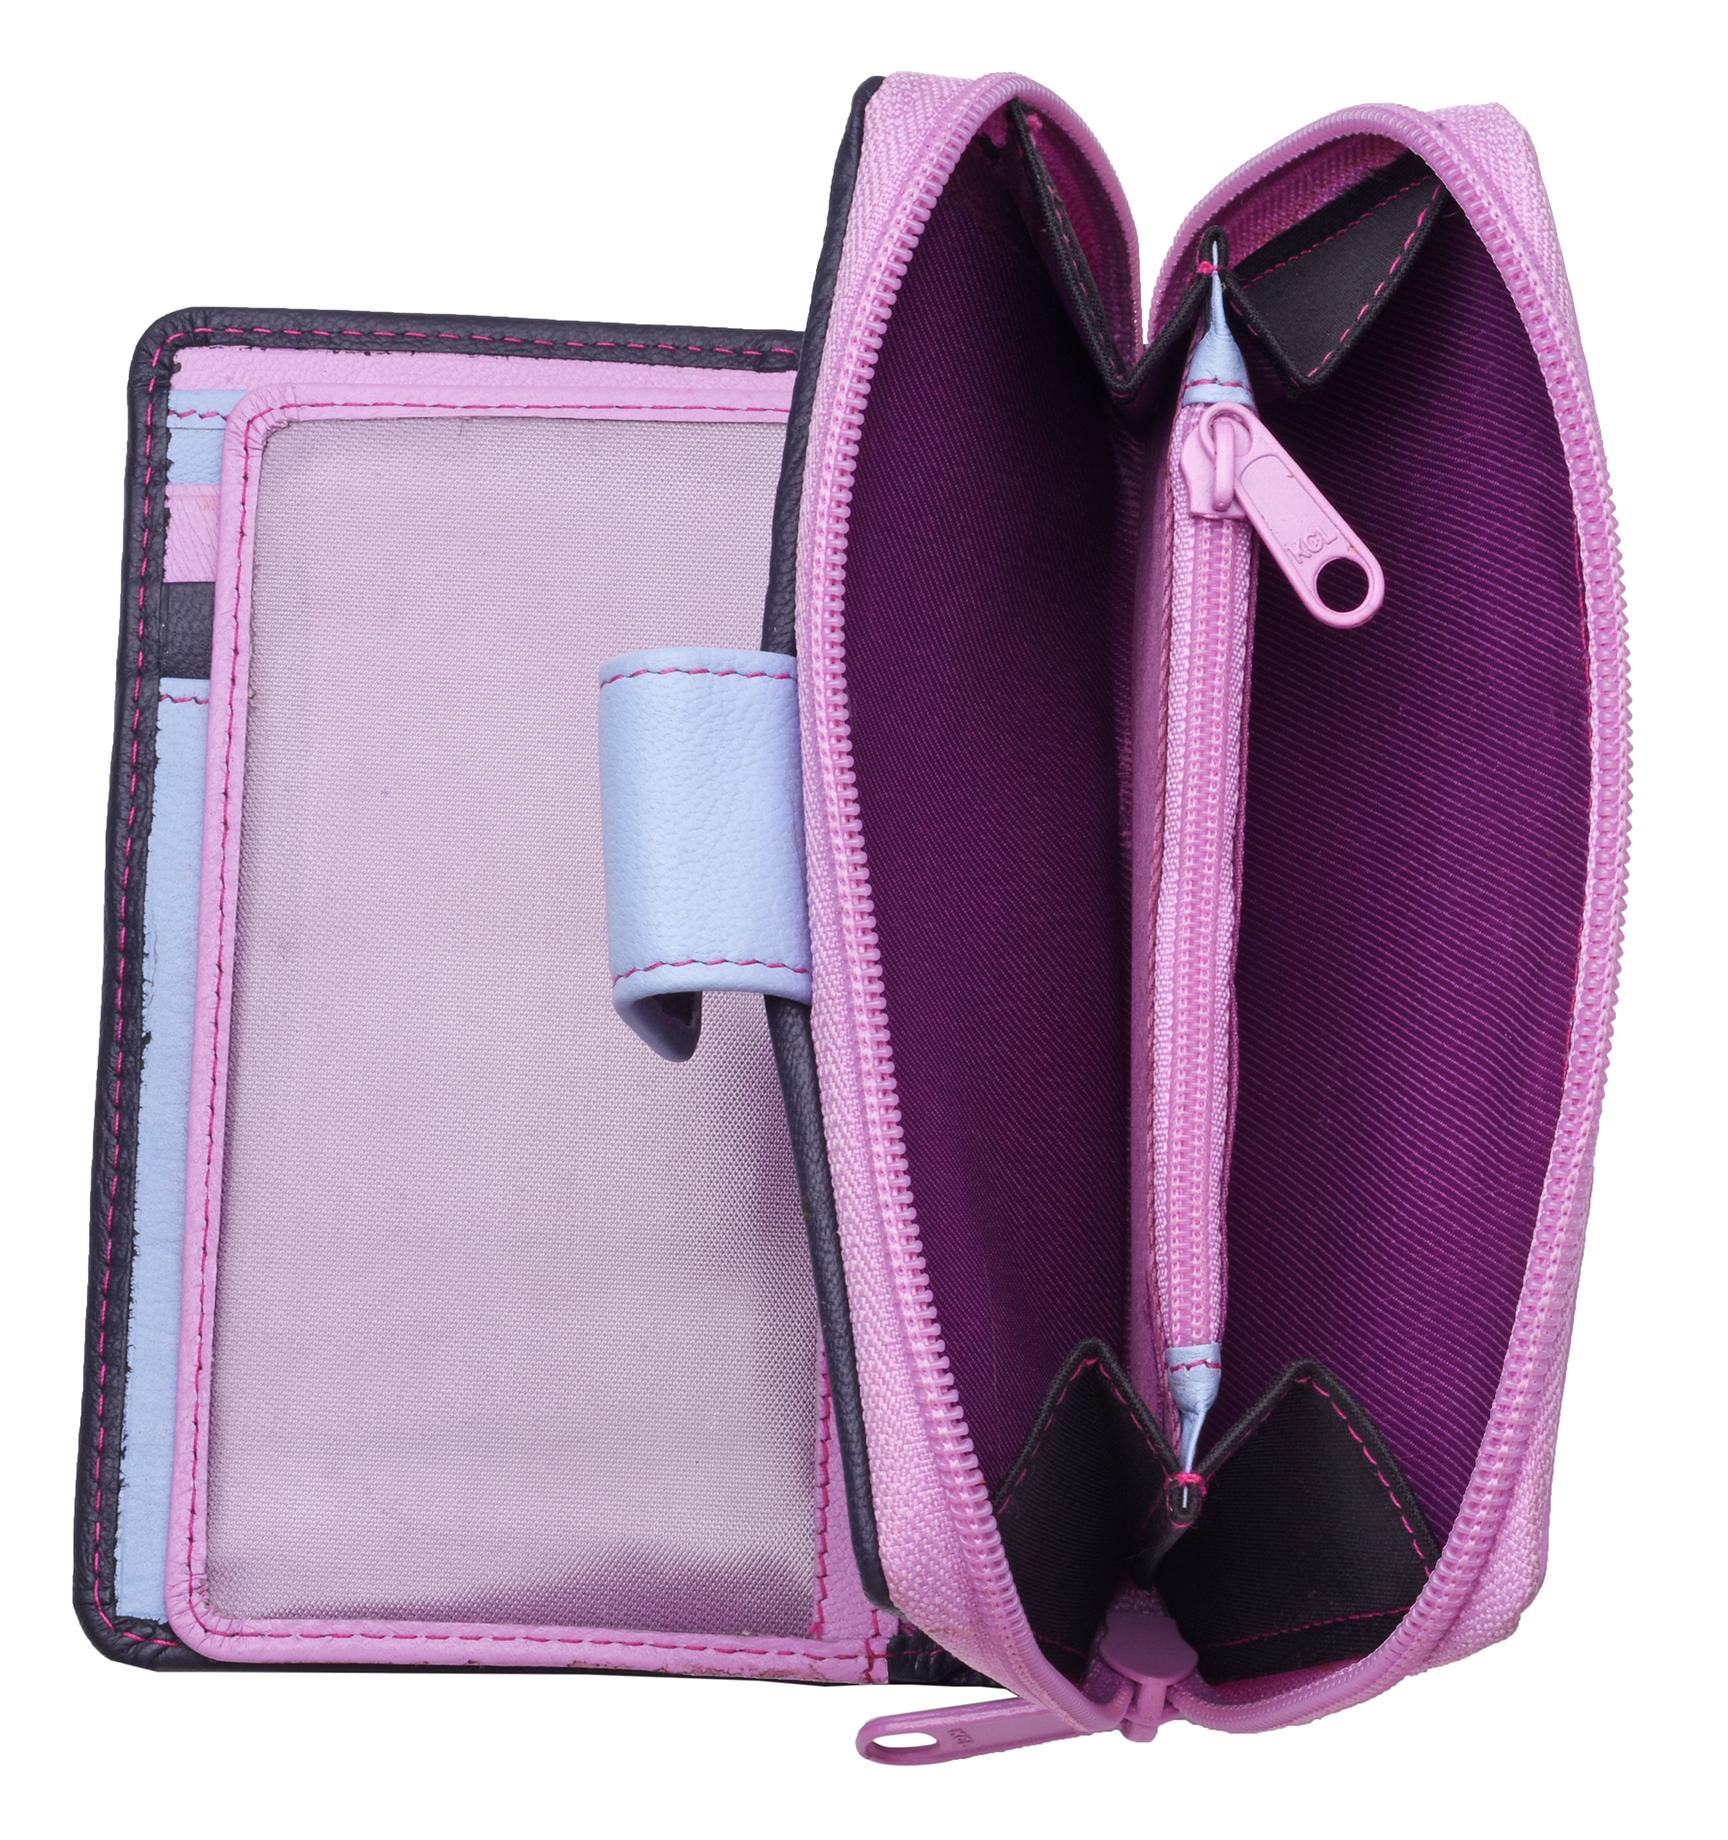 Ladies-Womens-RFID-Blocking-Safe-Leather-Bifold-Medium-Purse-Wallet-Coin-Section thumbnail 13